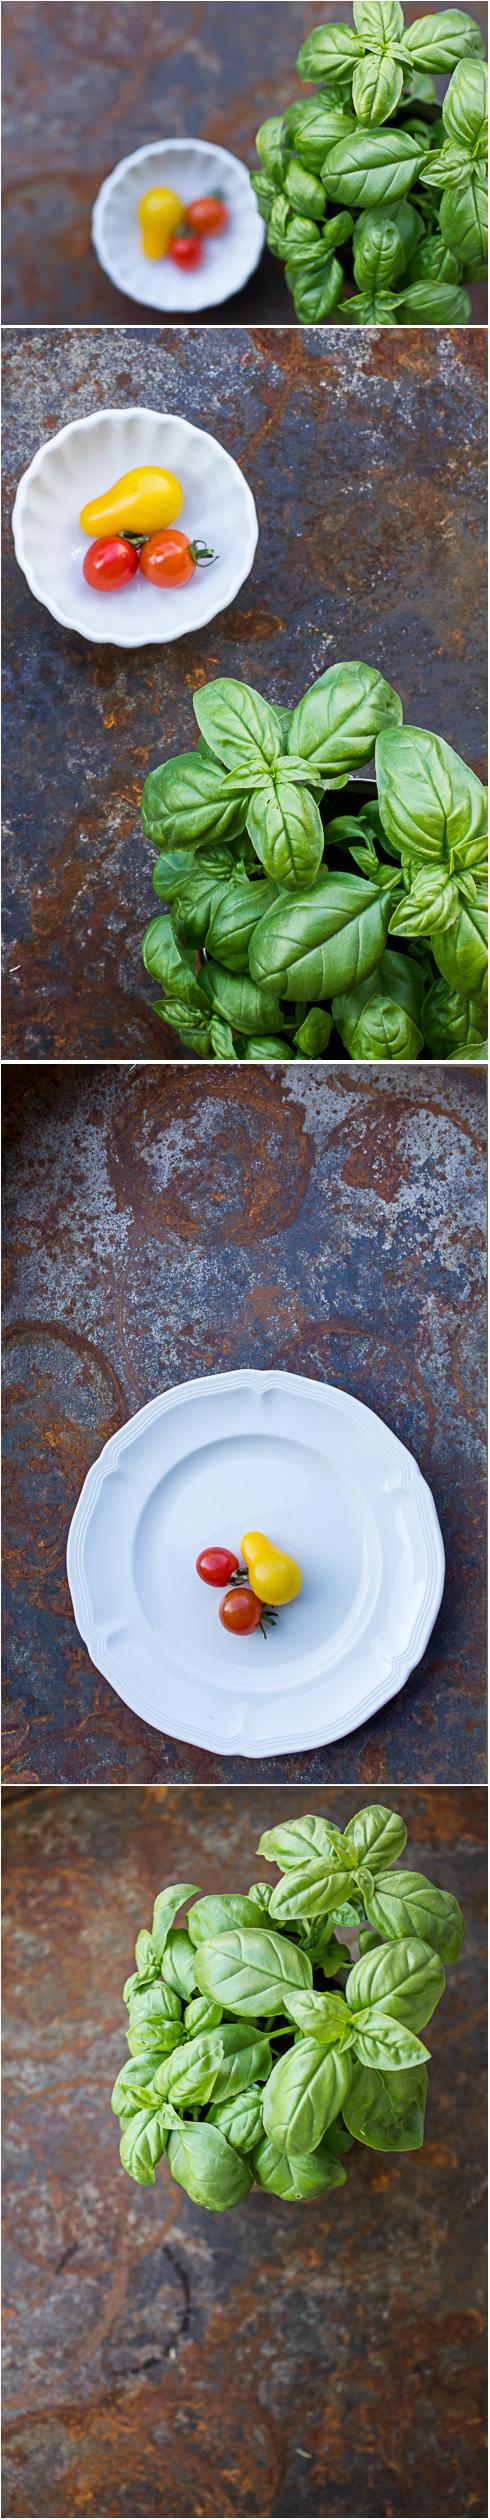 Tomato & Basil Harvest. Photography ©2012 Helena McMurdo